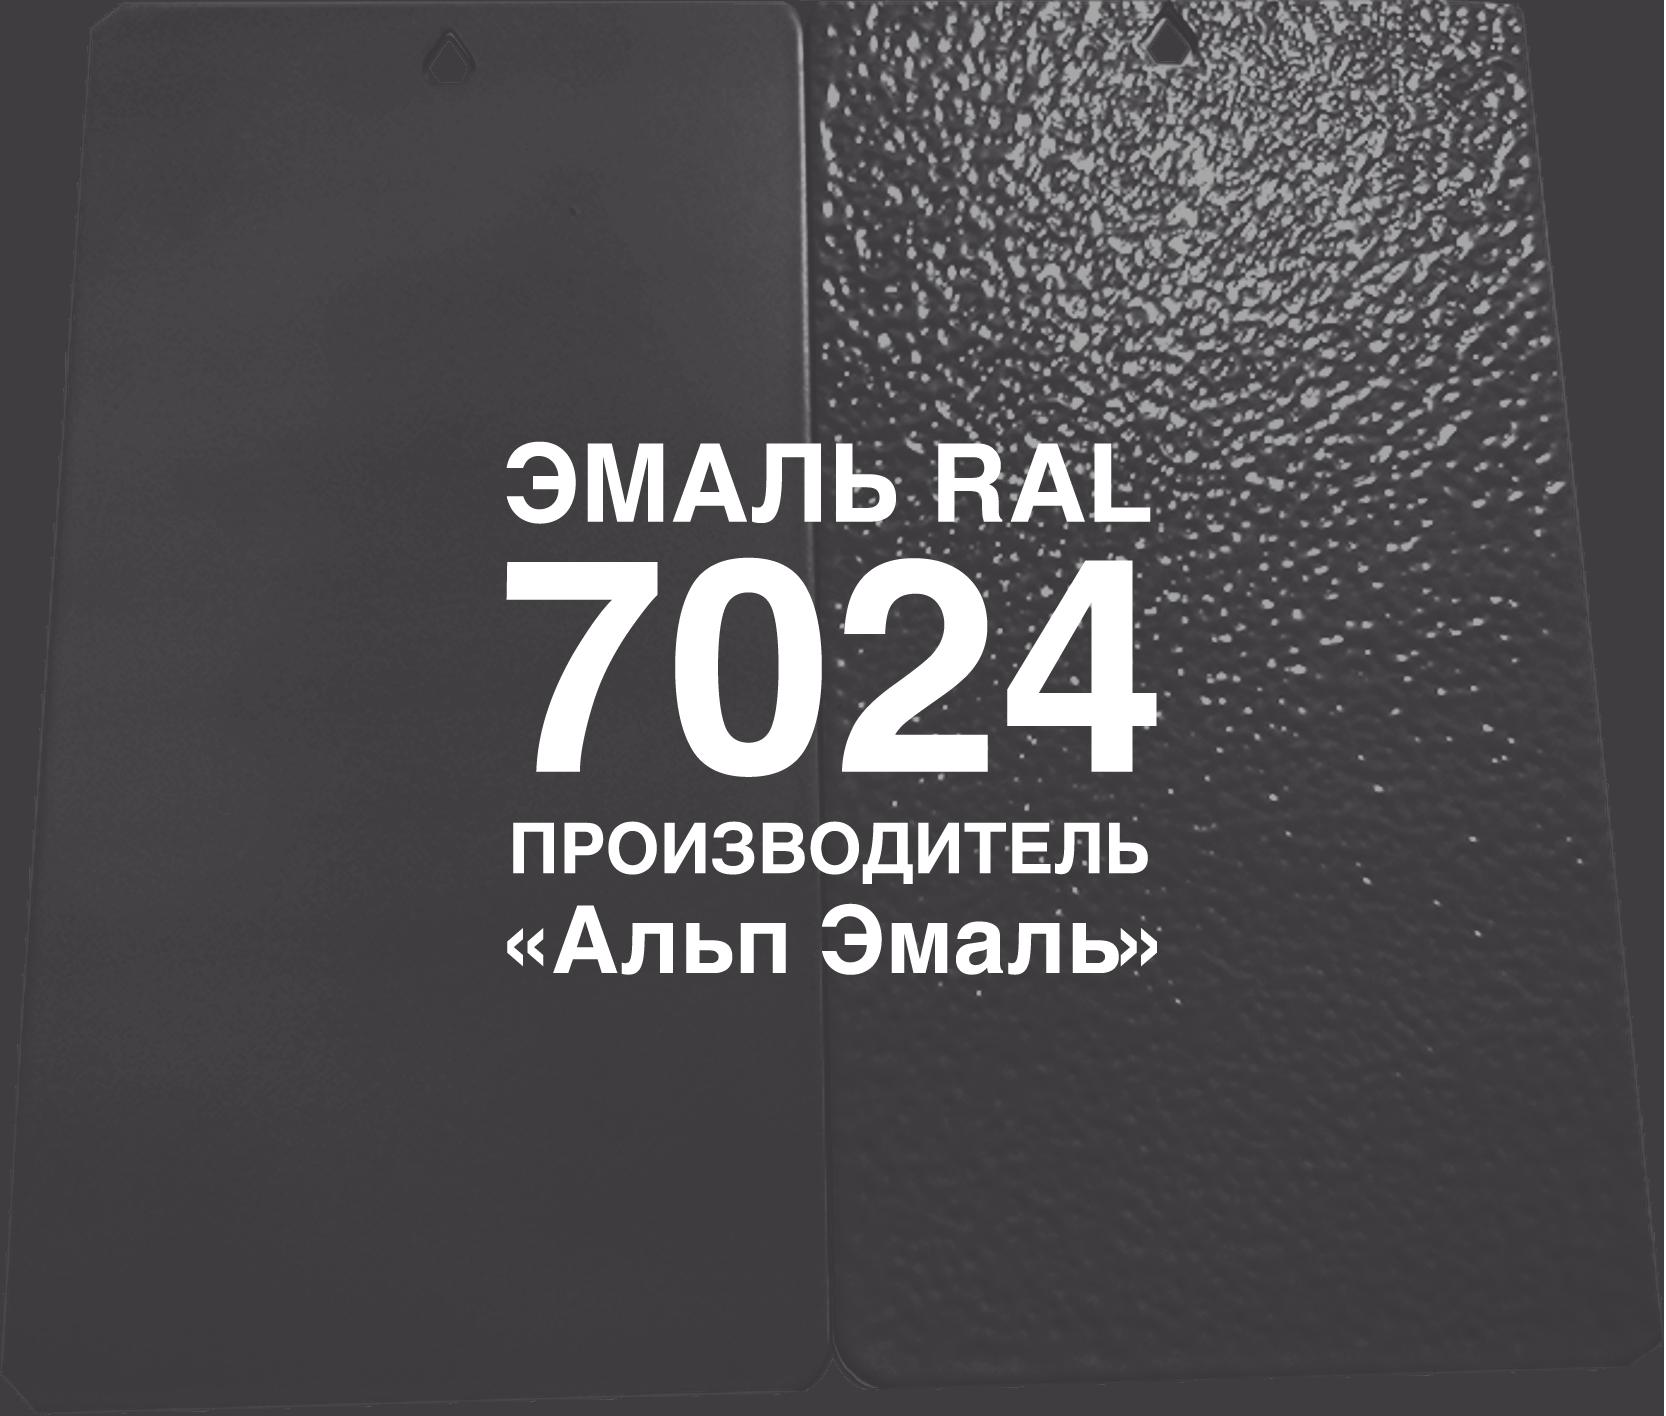 Краска эмаль RAL 7024 серая ЗАО Альп Эмаль